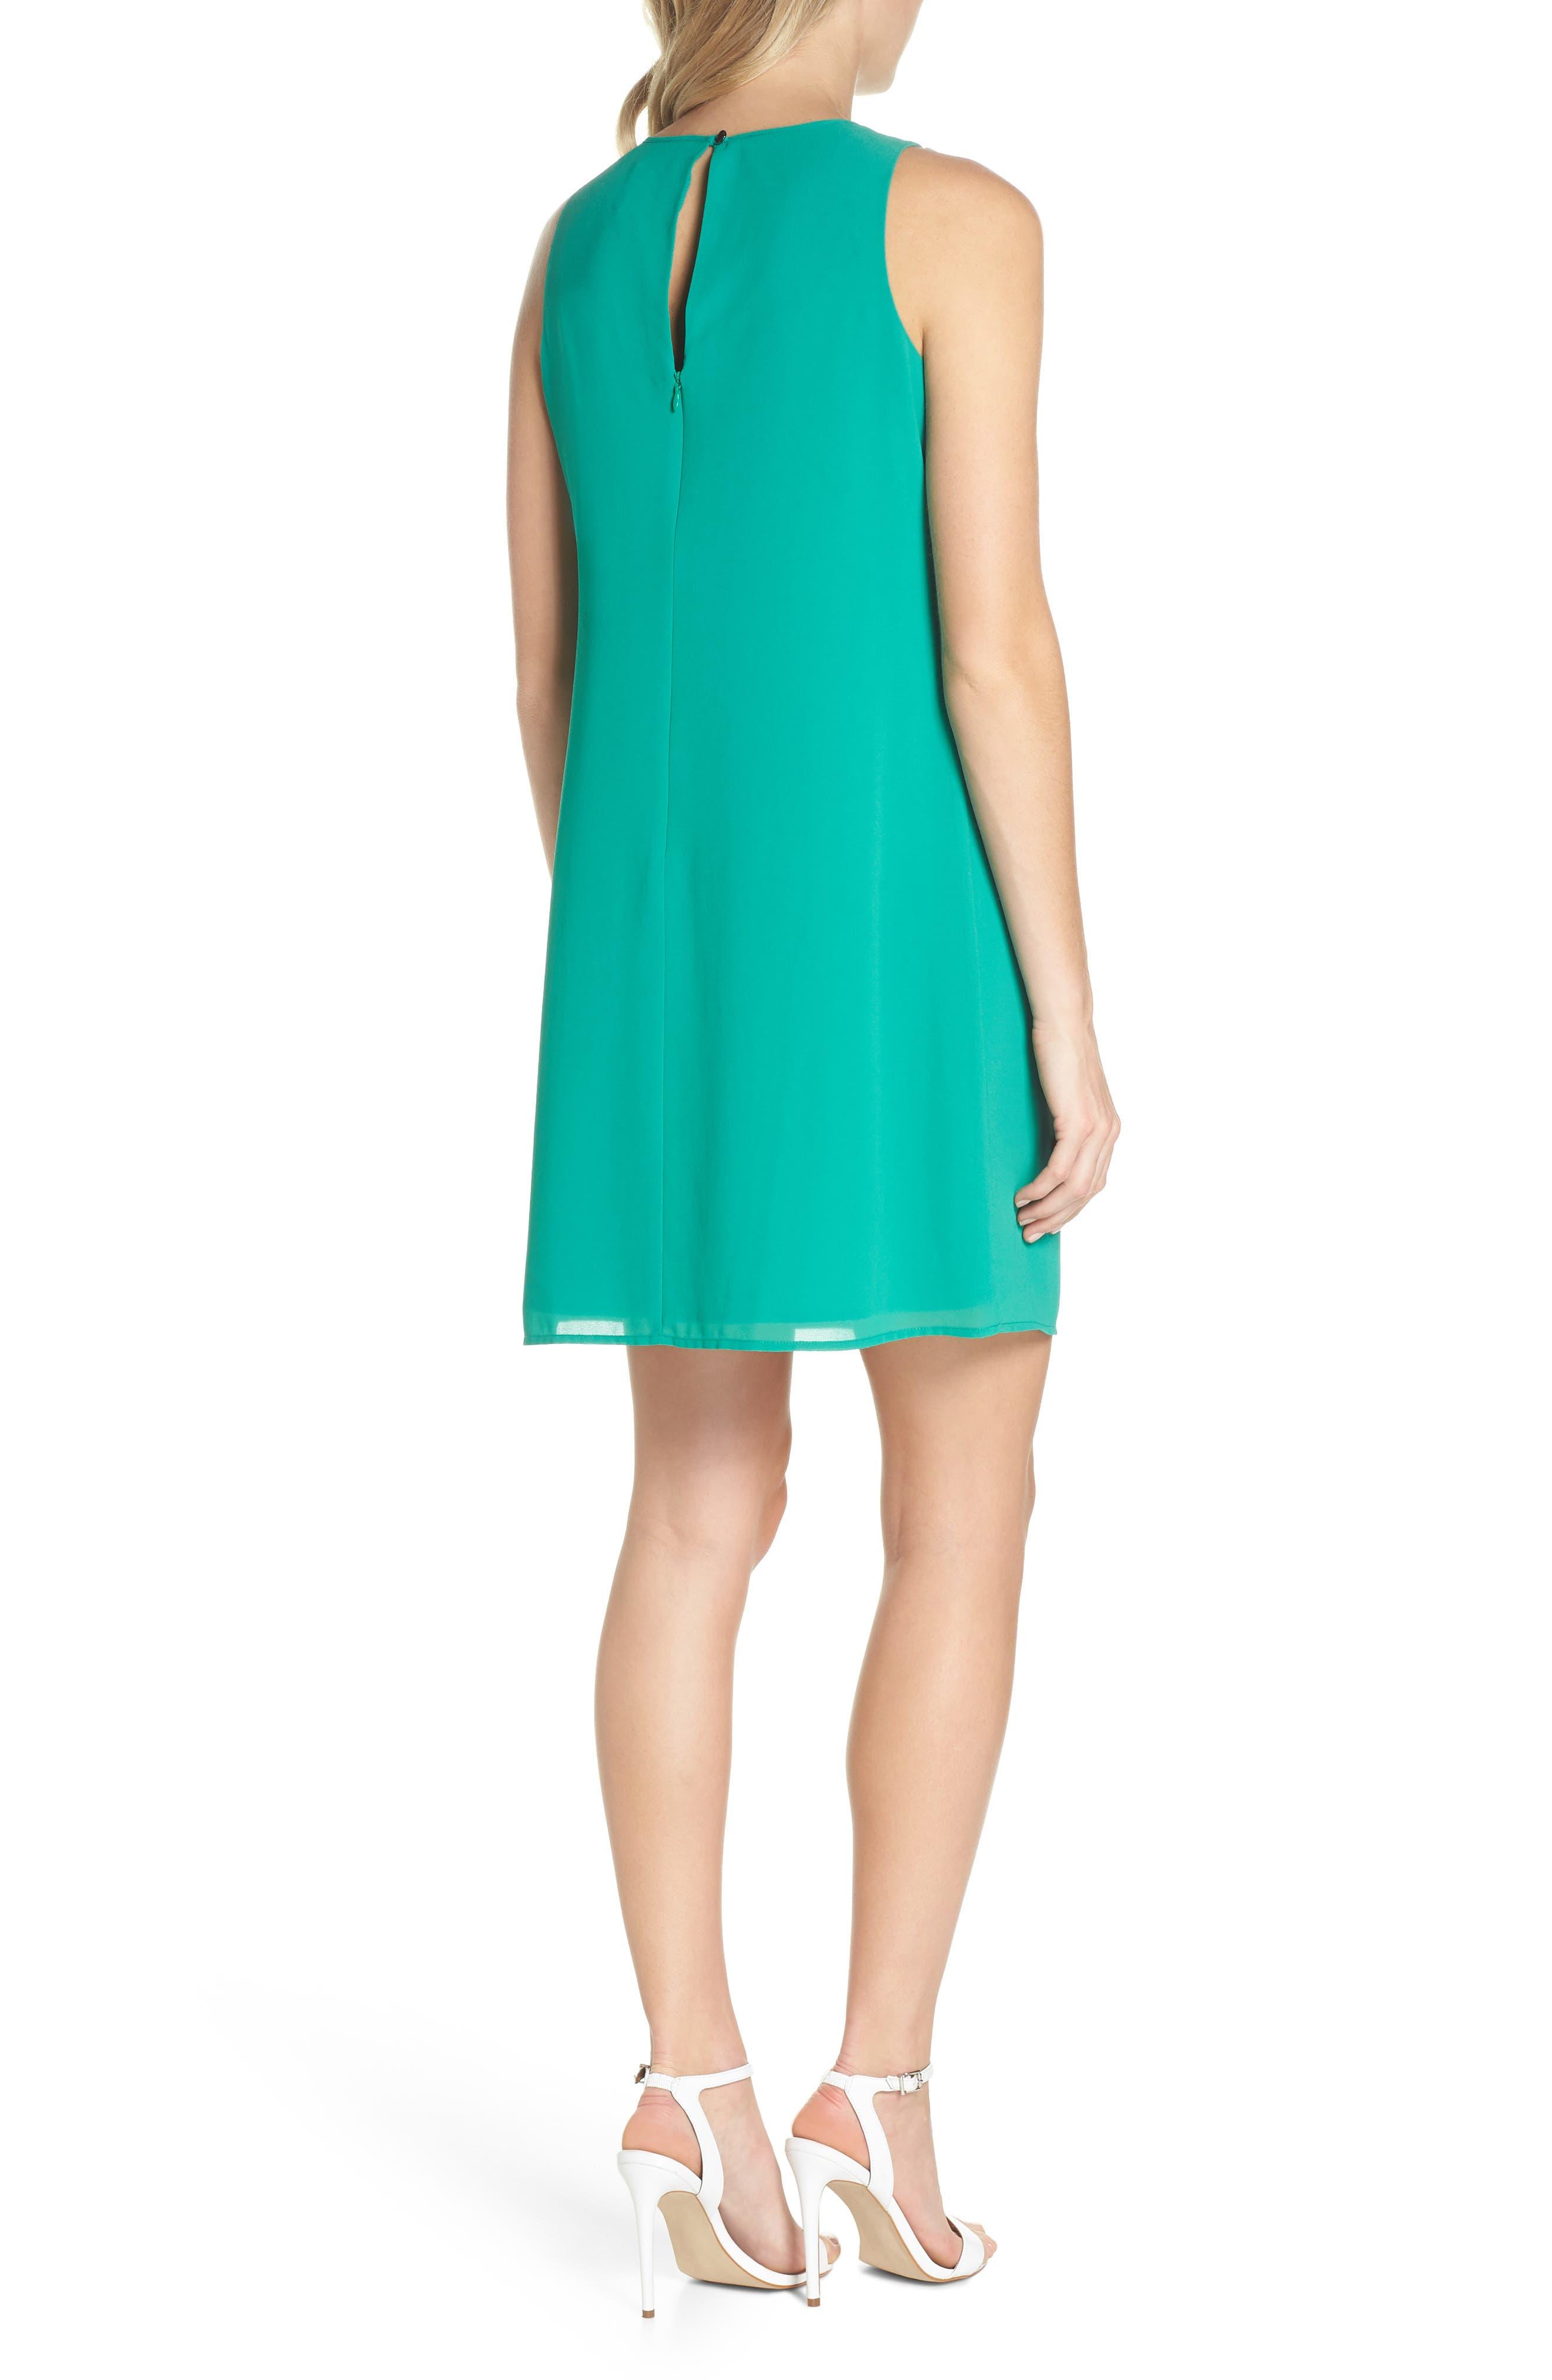 Soufflé Ruffle Chiffon Shift Dress,                             Alternate thumbnail 2, color,                             Green